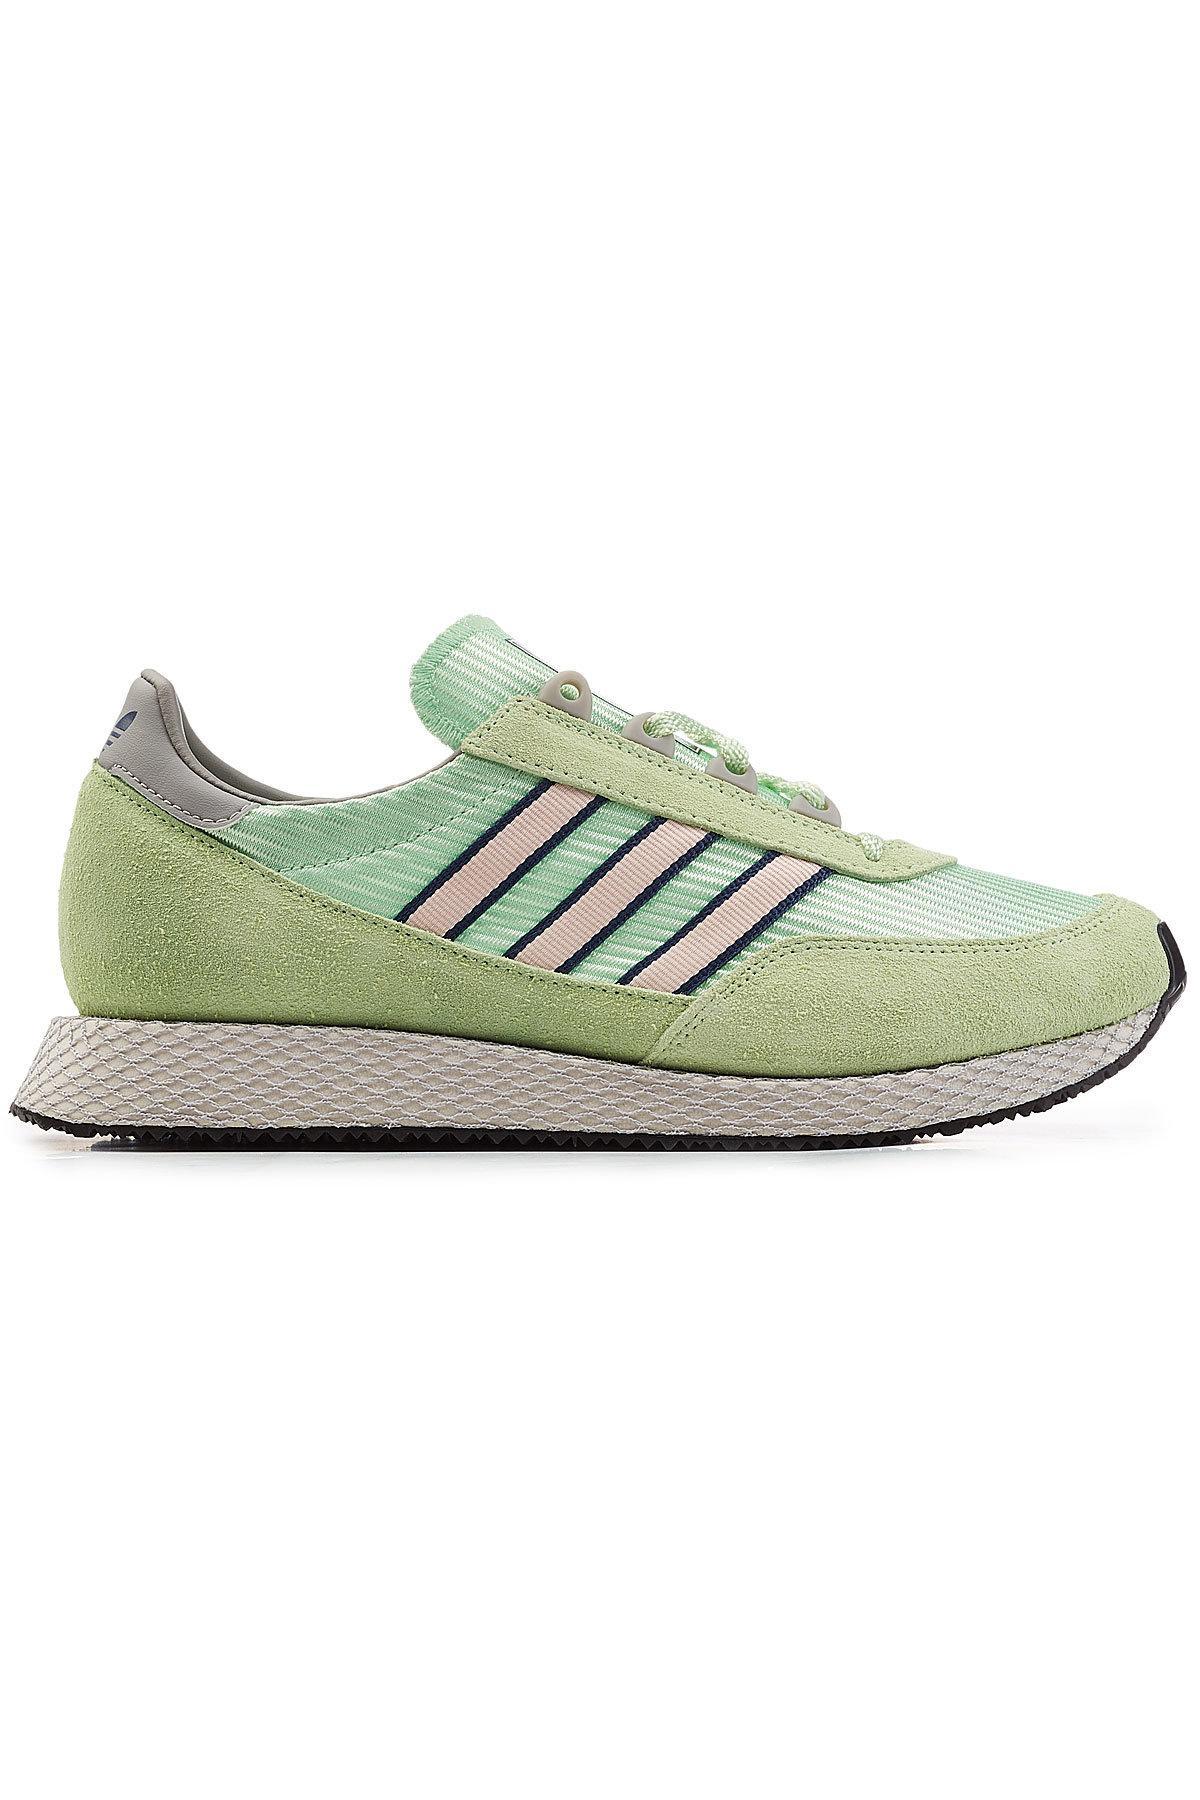 best service 0b57d f8fed Adidas Originals - Multicolor Glenbuck Spzl Sneakers With Suede for Men -  Lyst. View fullscreen